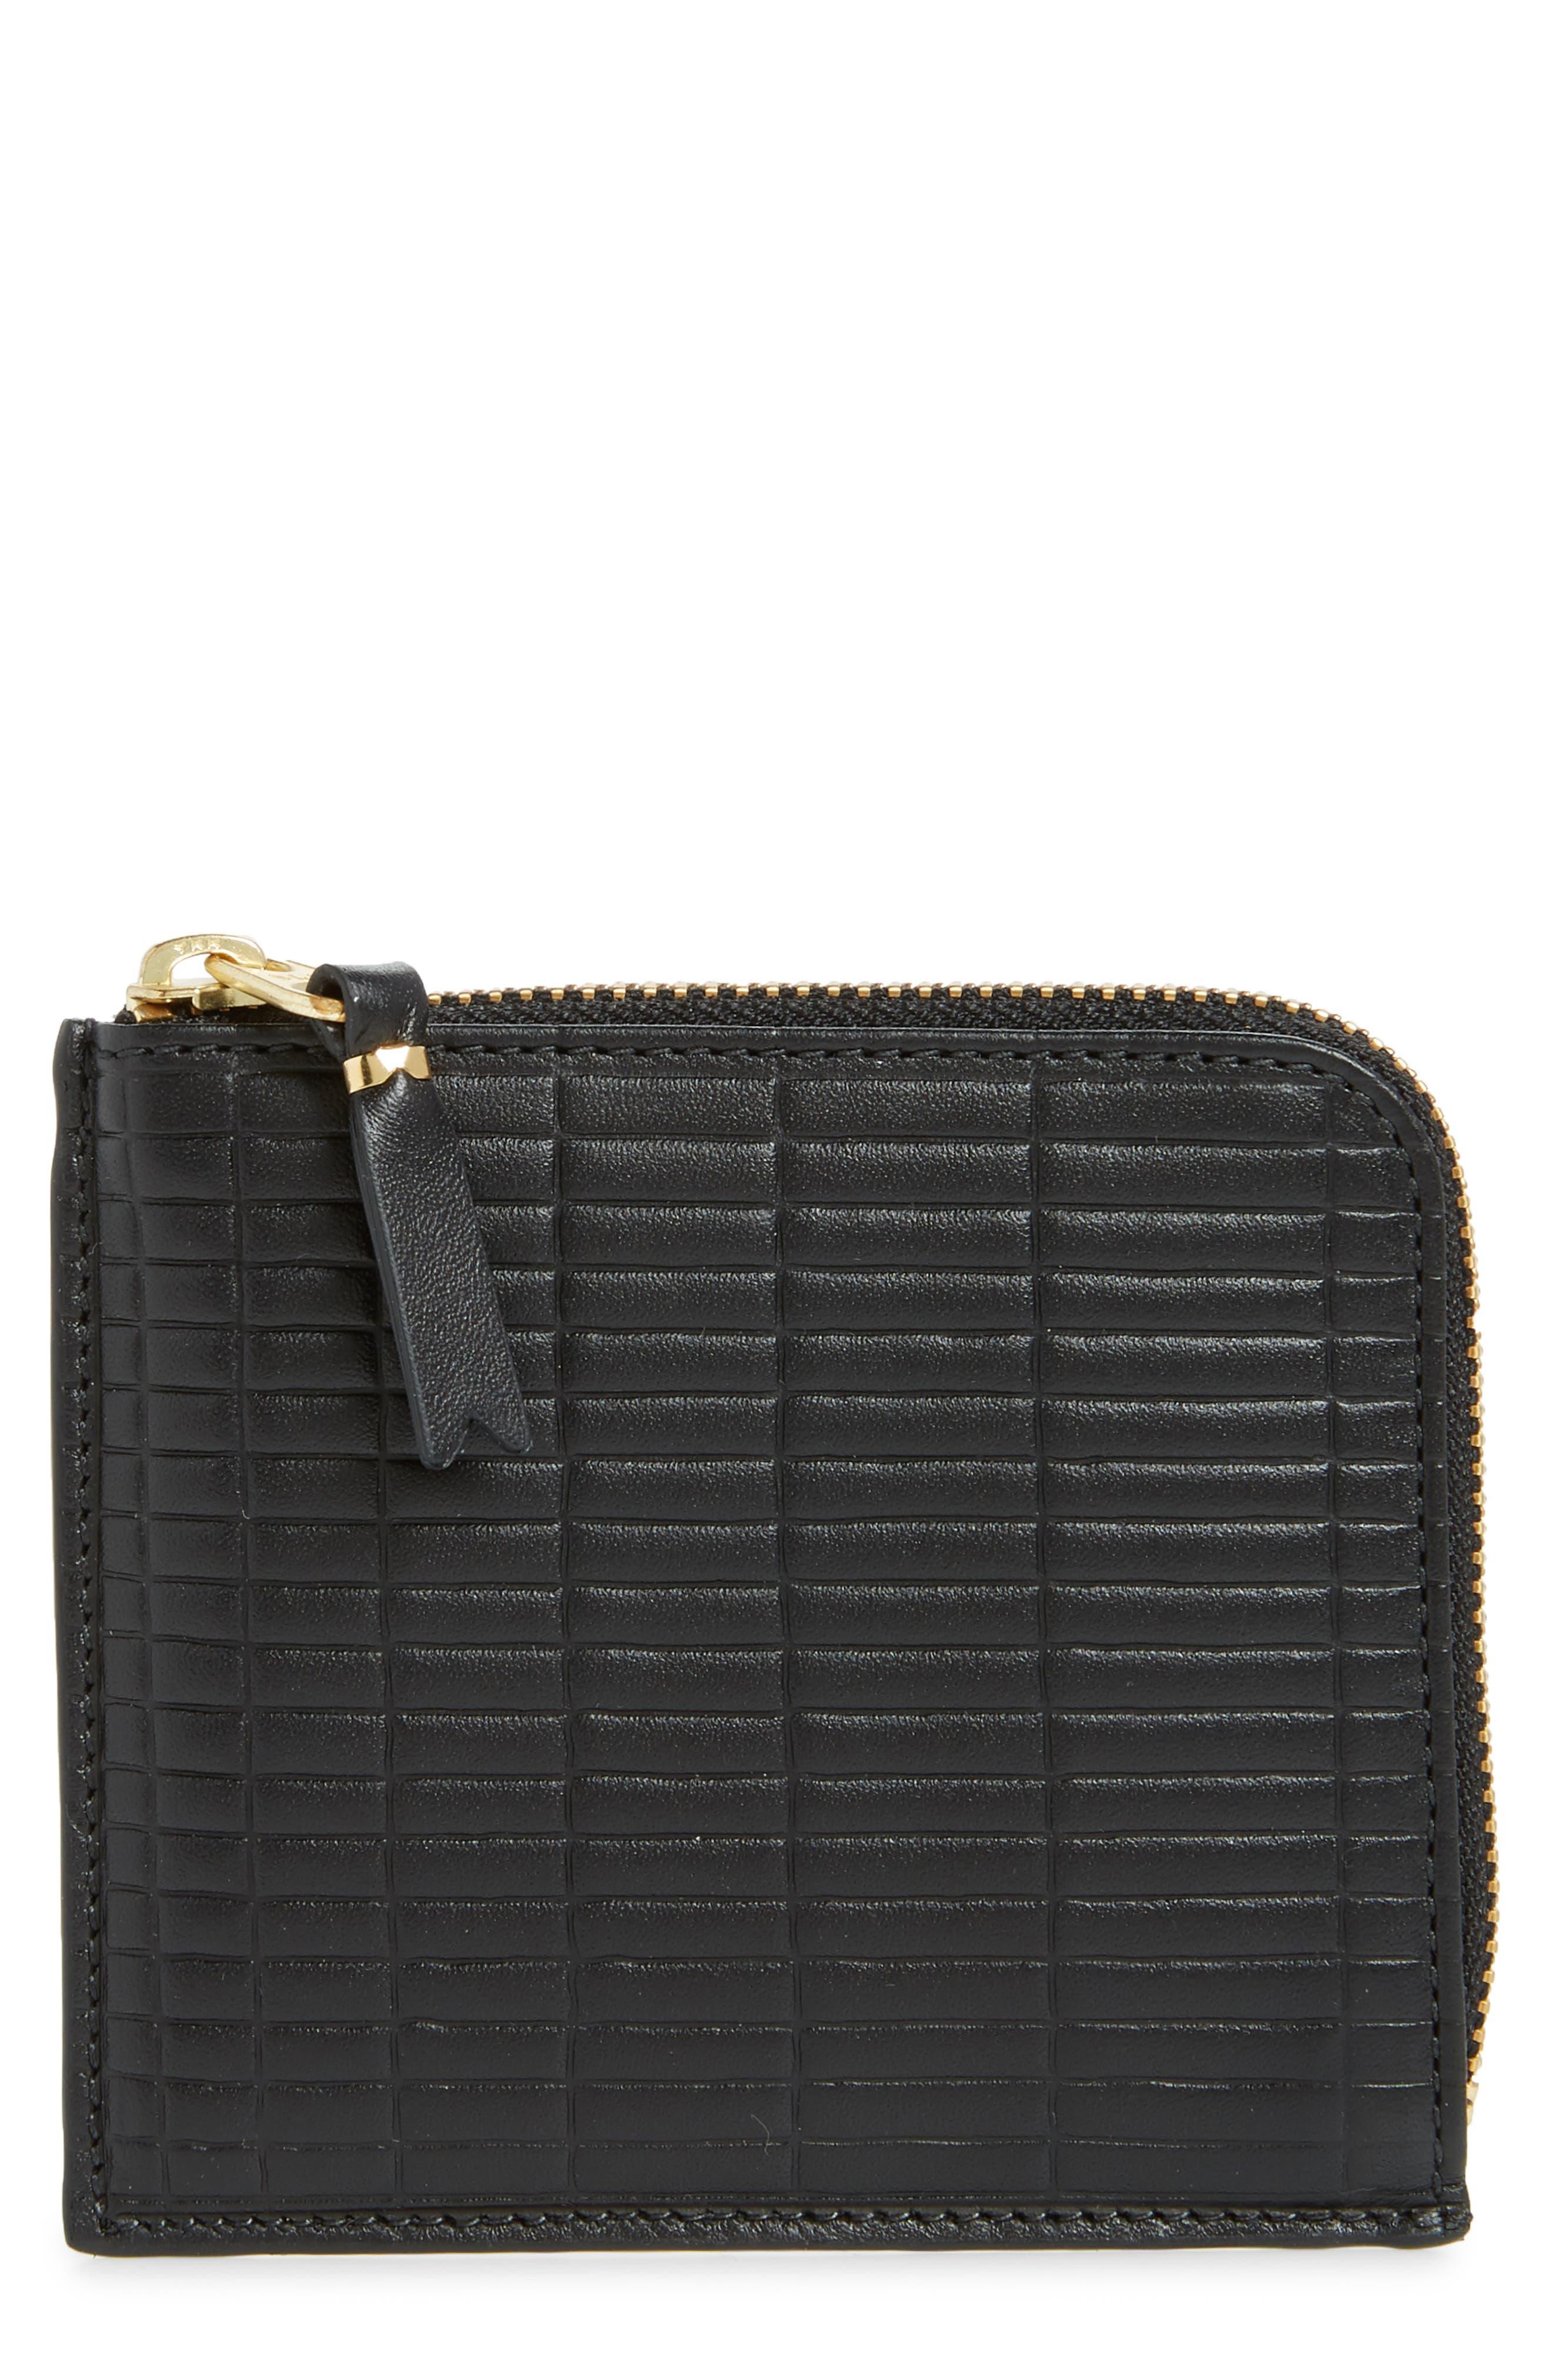 5faac8c7fa56 Women s Designer Wallets   Accessories